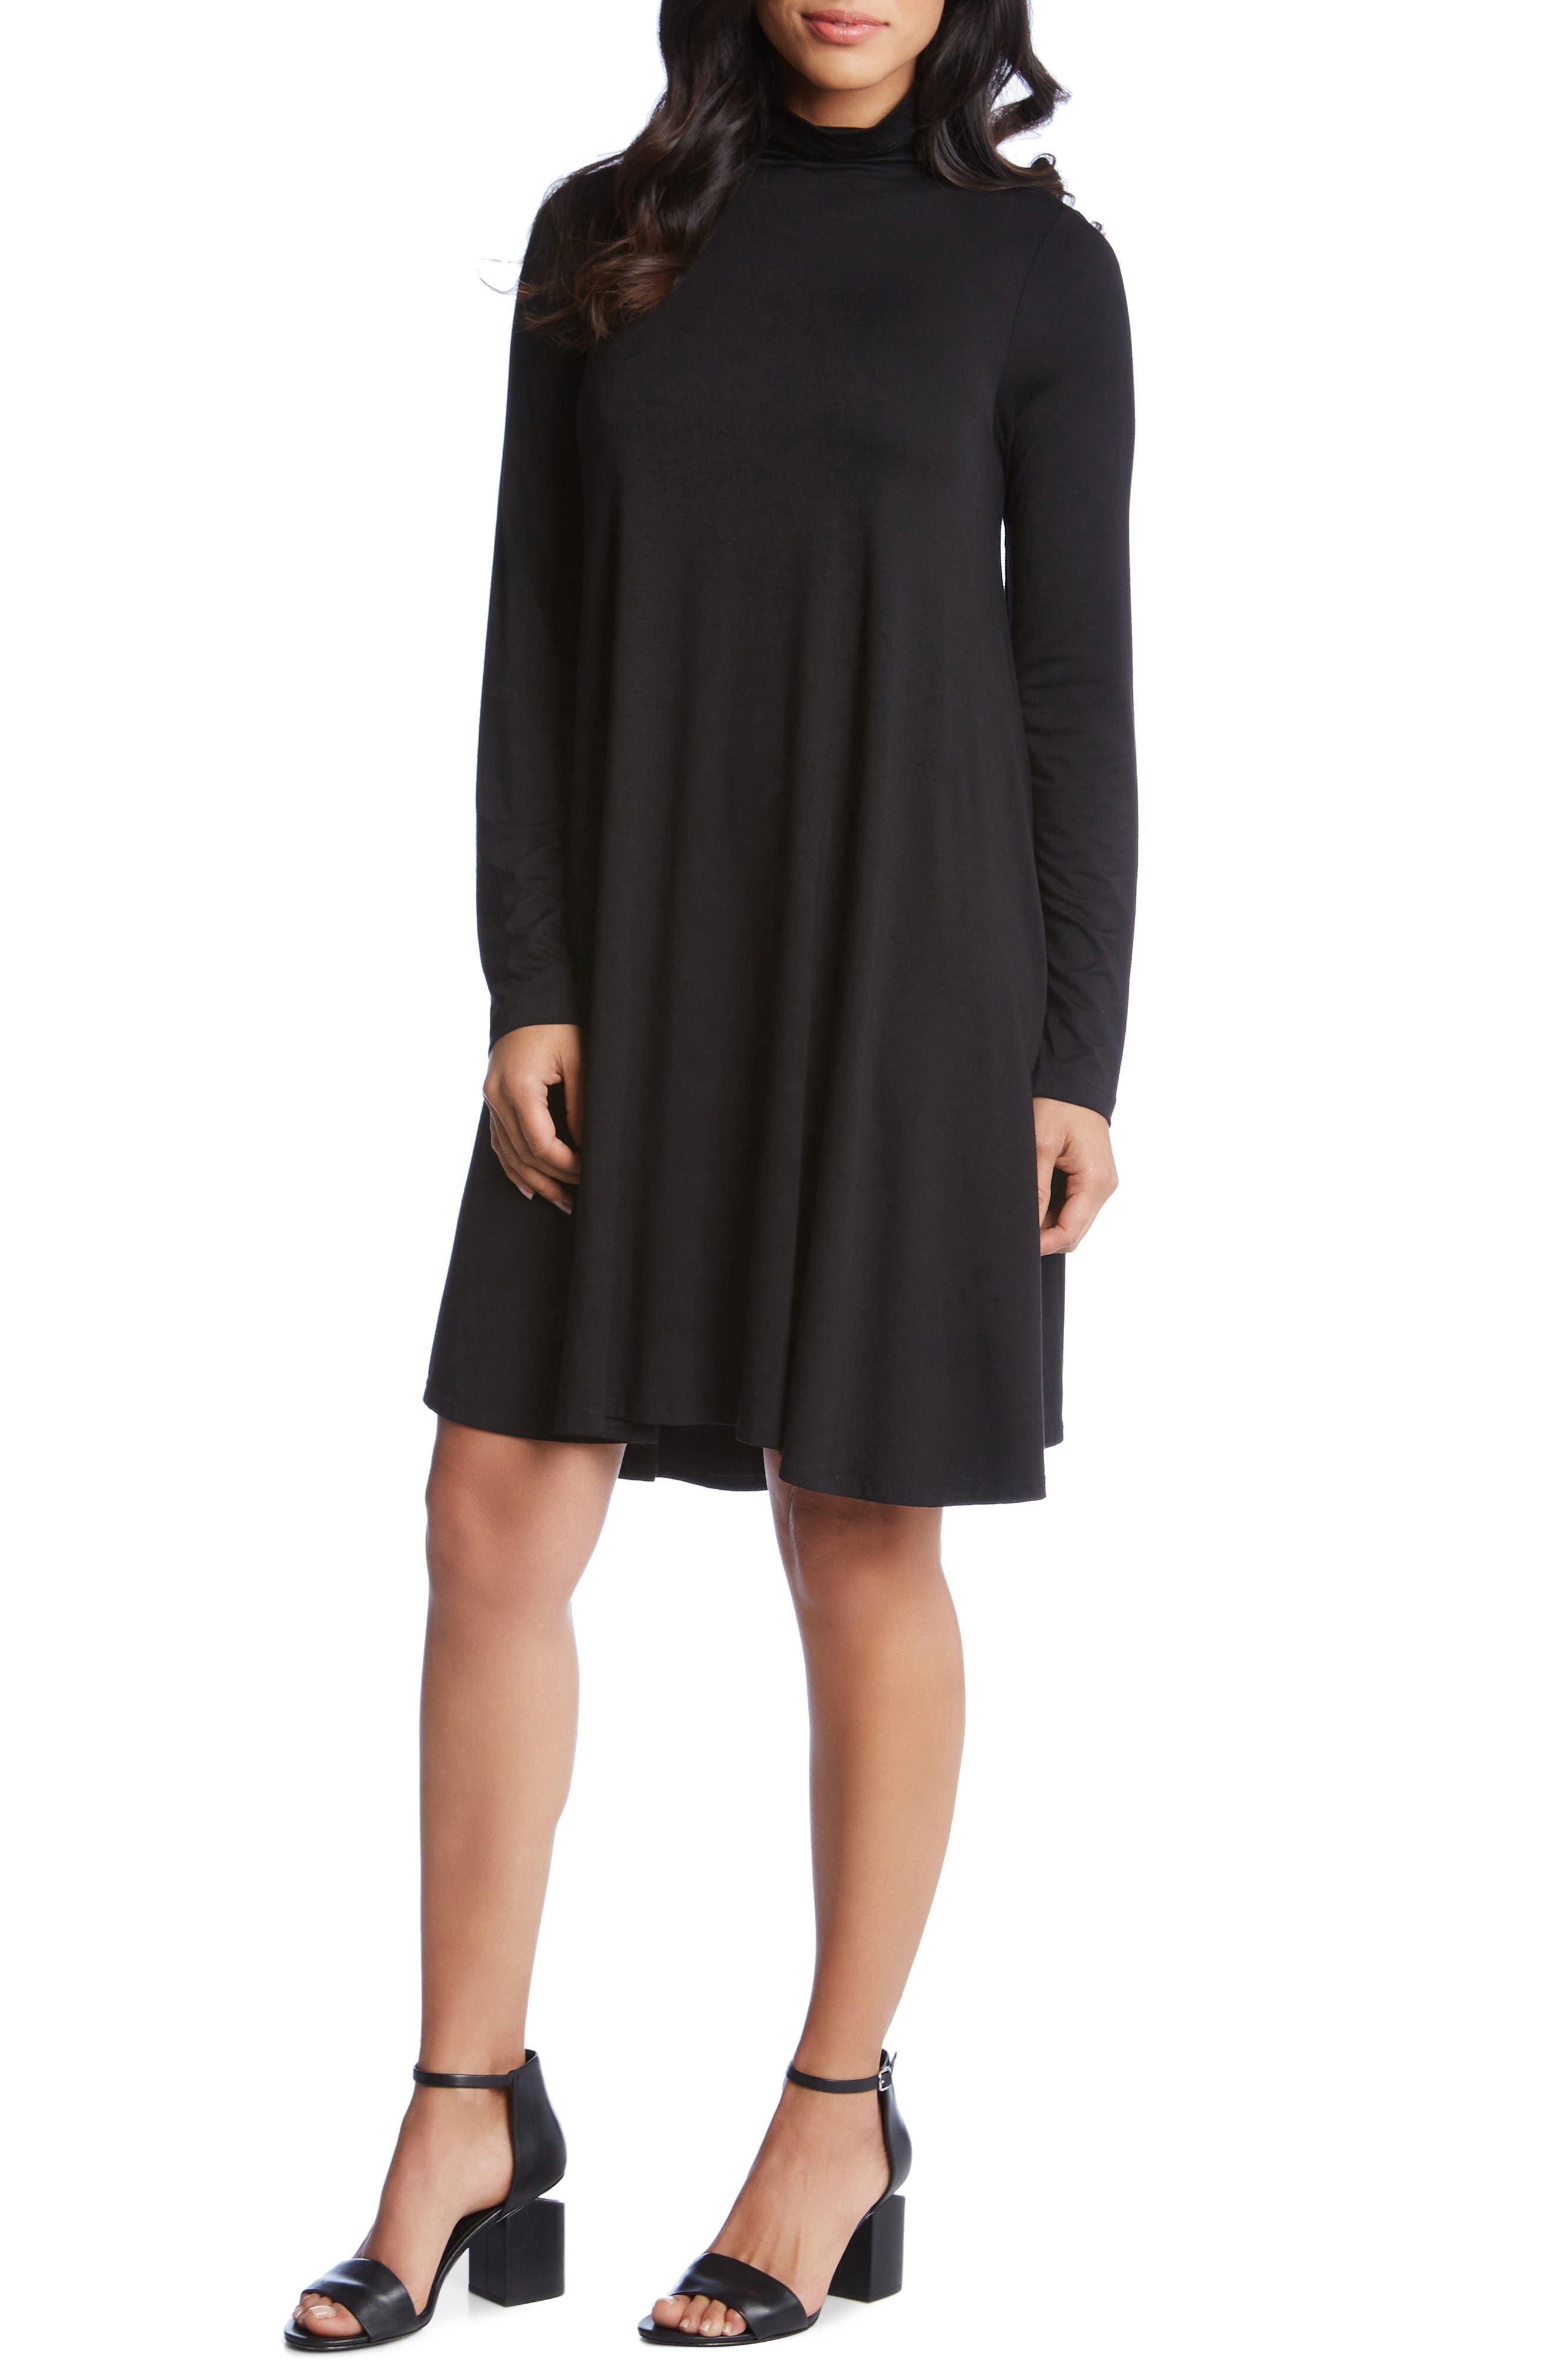 KAREN KANE Maggie Turtleneck Trapeze Dress, Main, color, BLACK